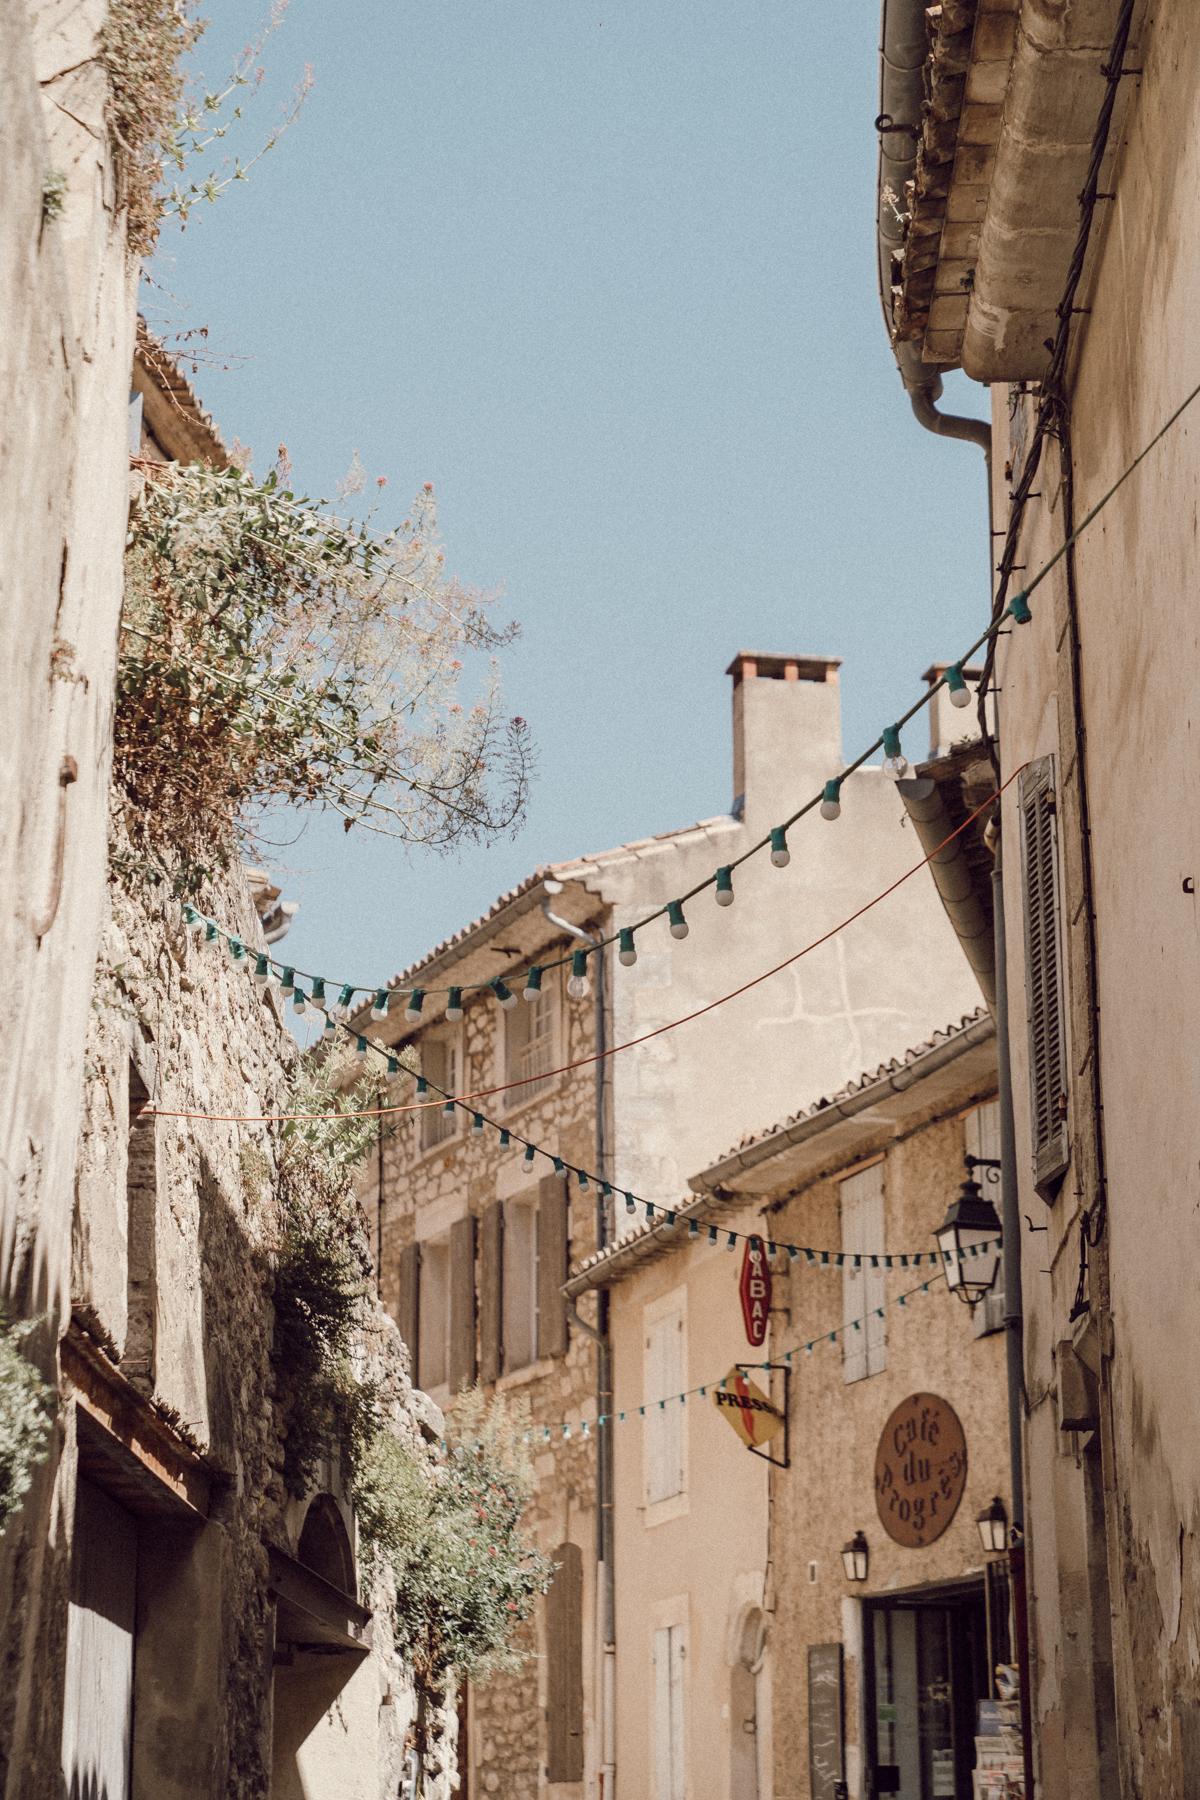 provence-menerbes-oppede-isle-sur-la-sorgue-60